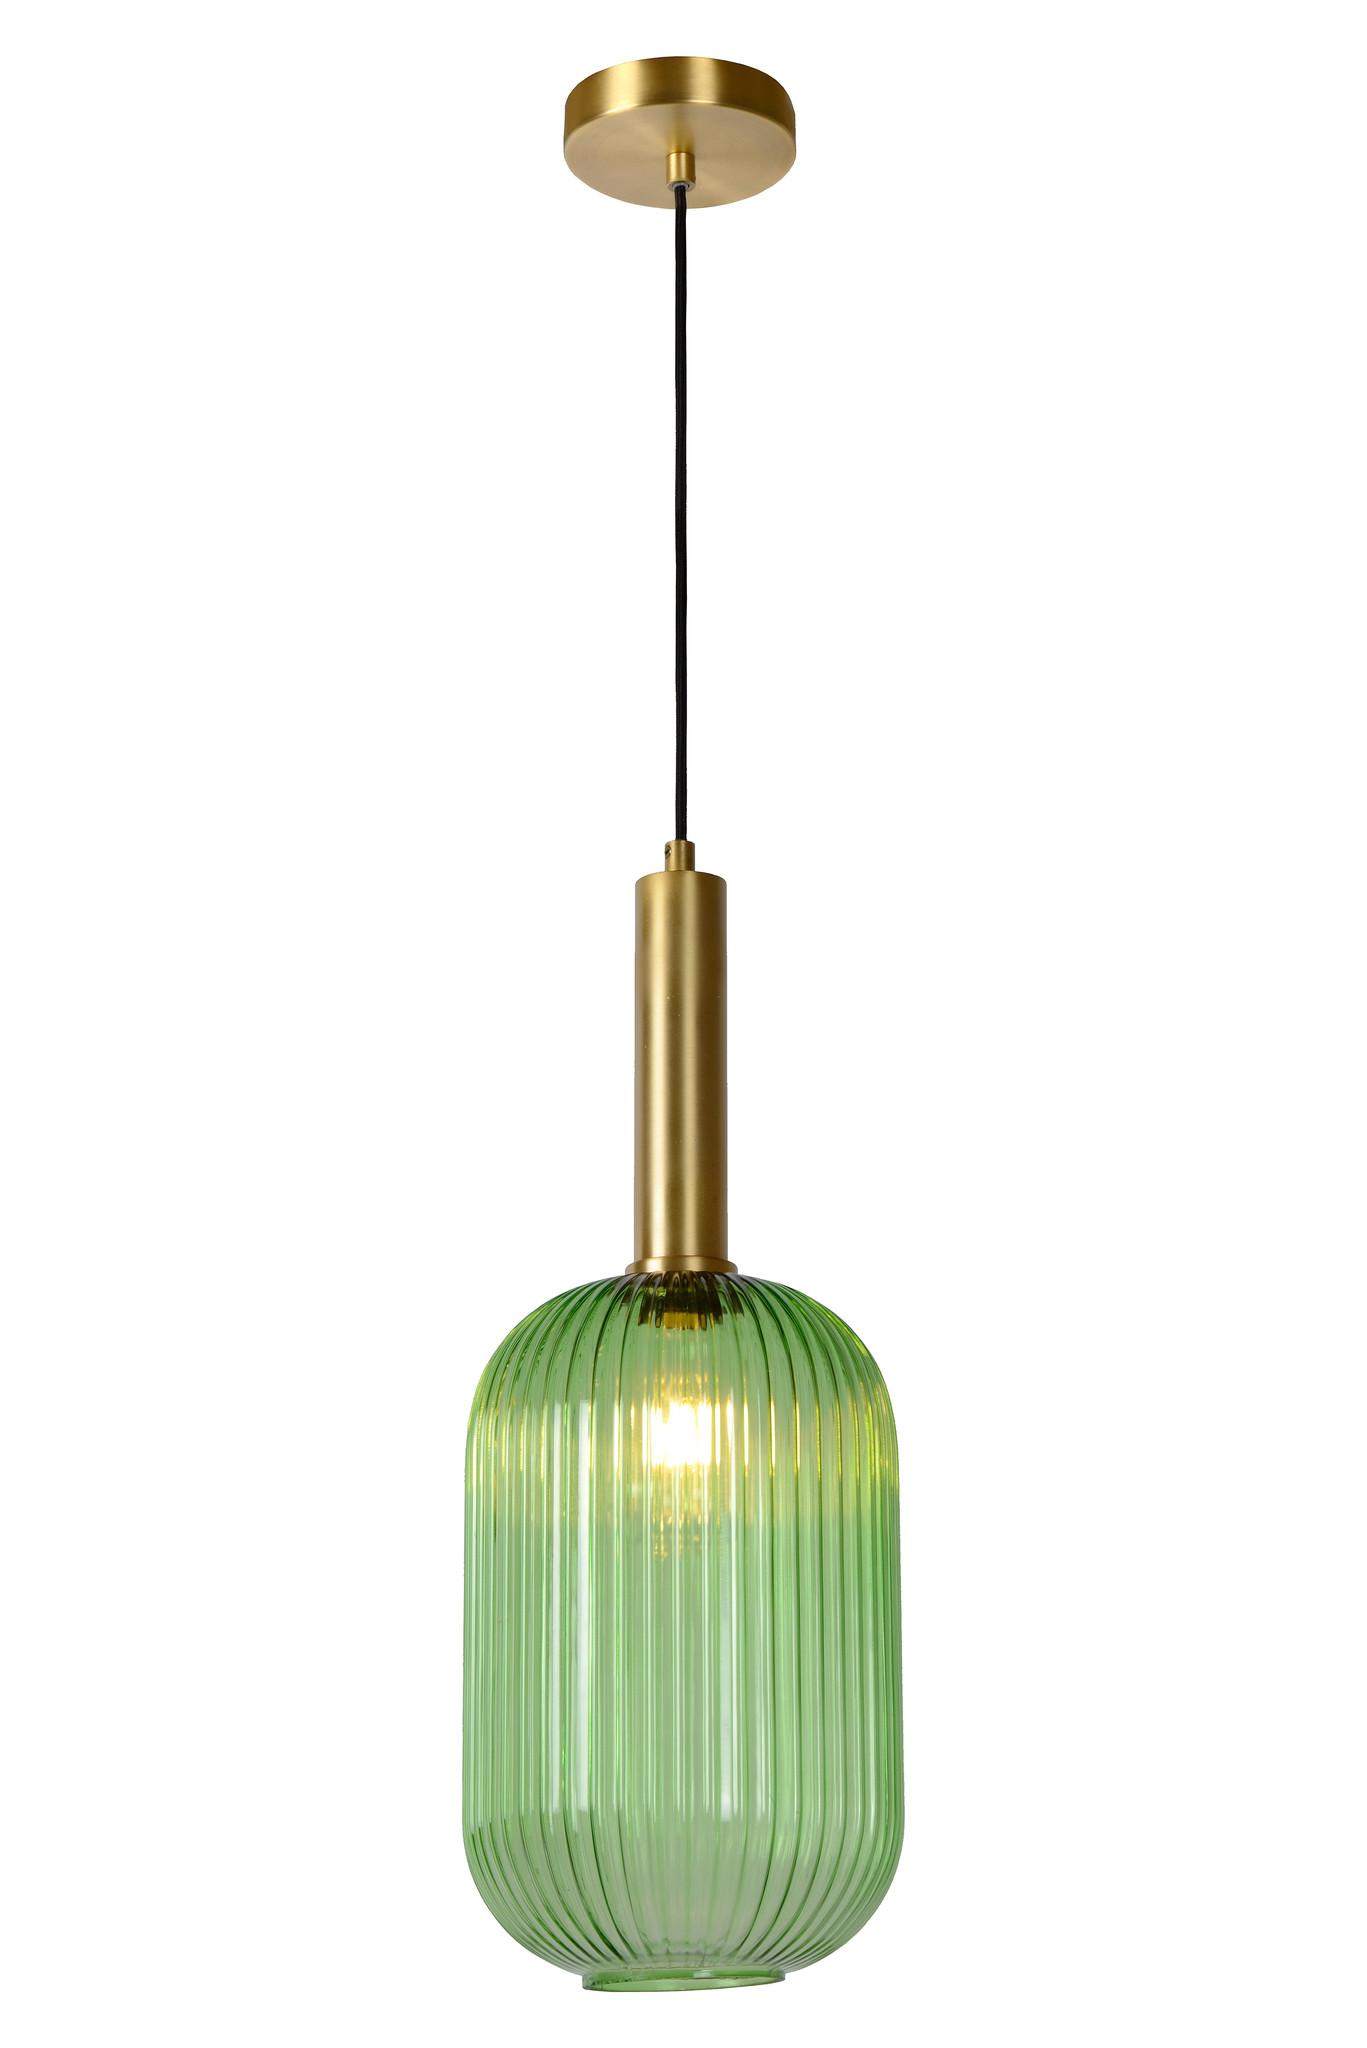 Lucide MALOTO Hanglamp Ø 20cm E27/40W Groen/Messing